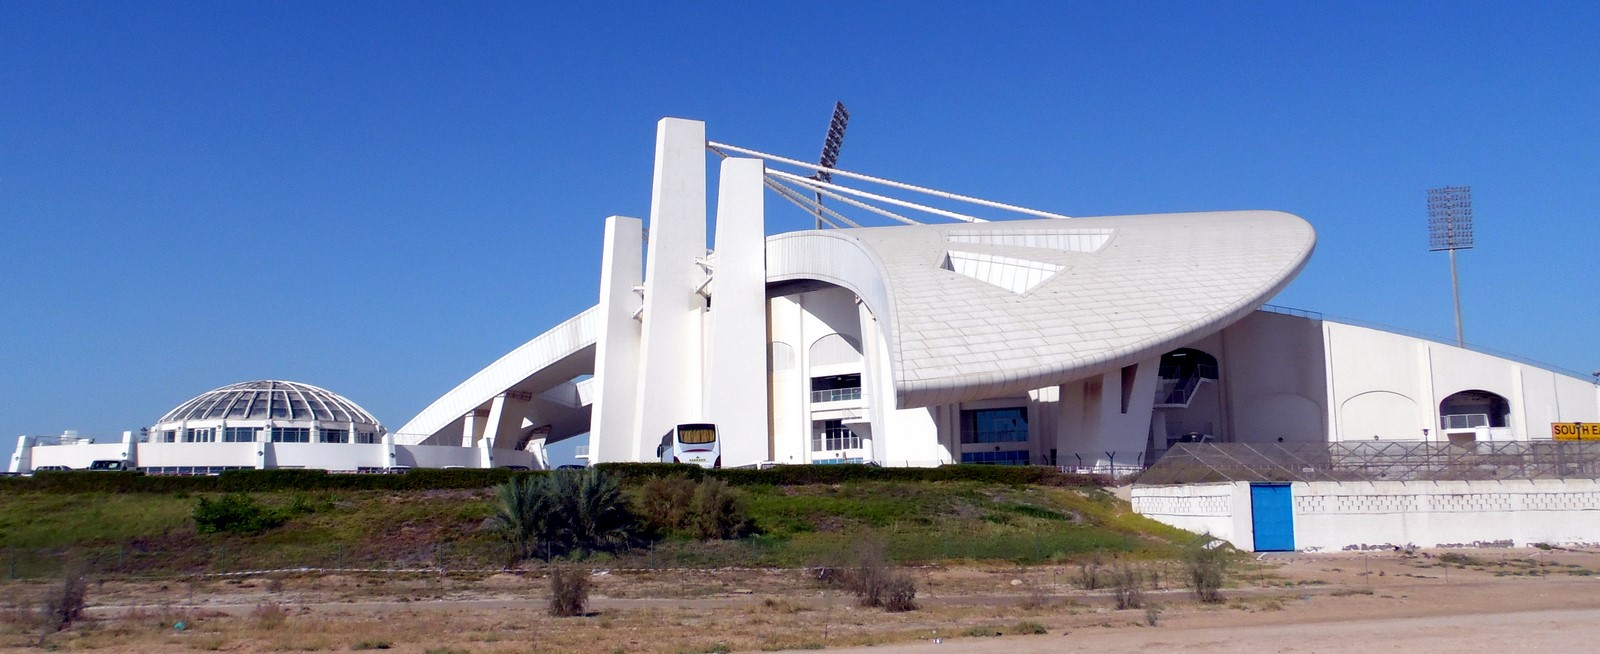 Sheikh Zayed Cricket Stadium, Abu Dhabi - Sheet1